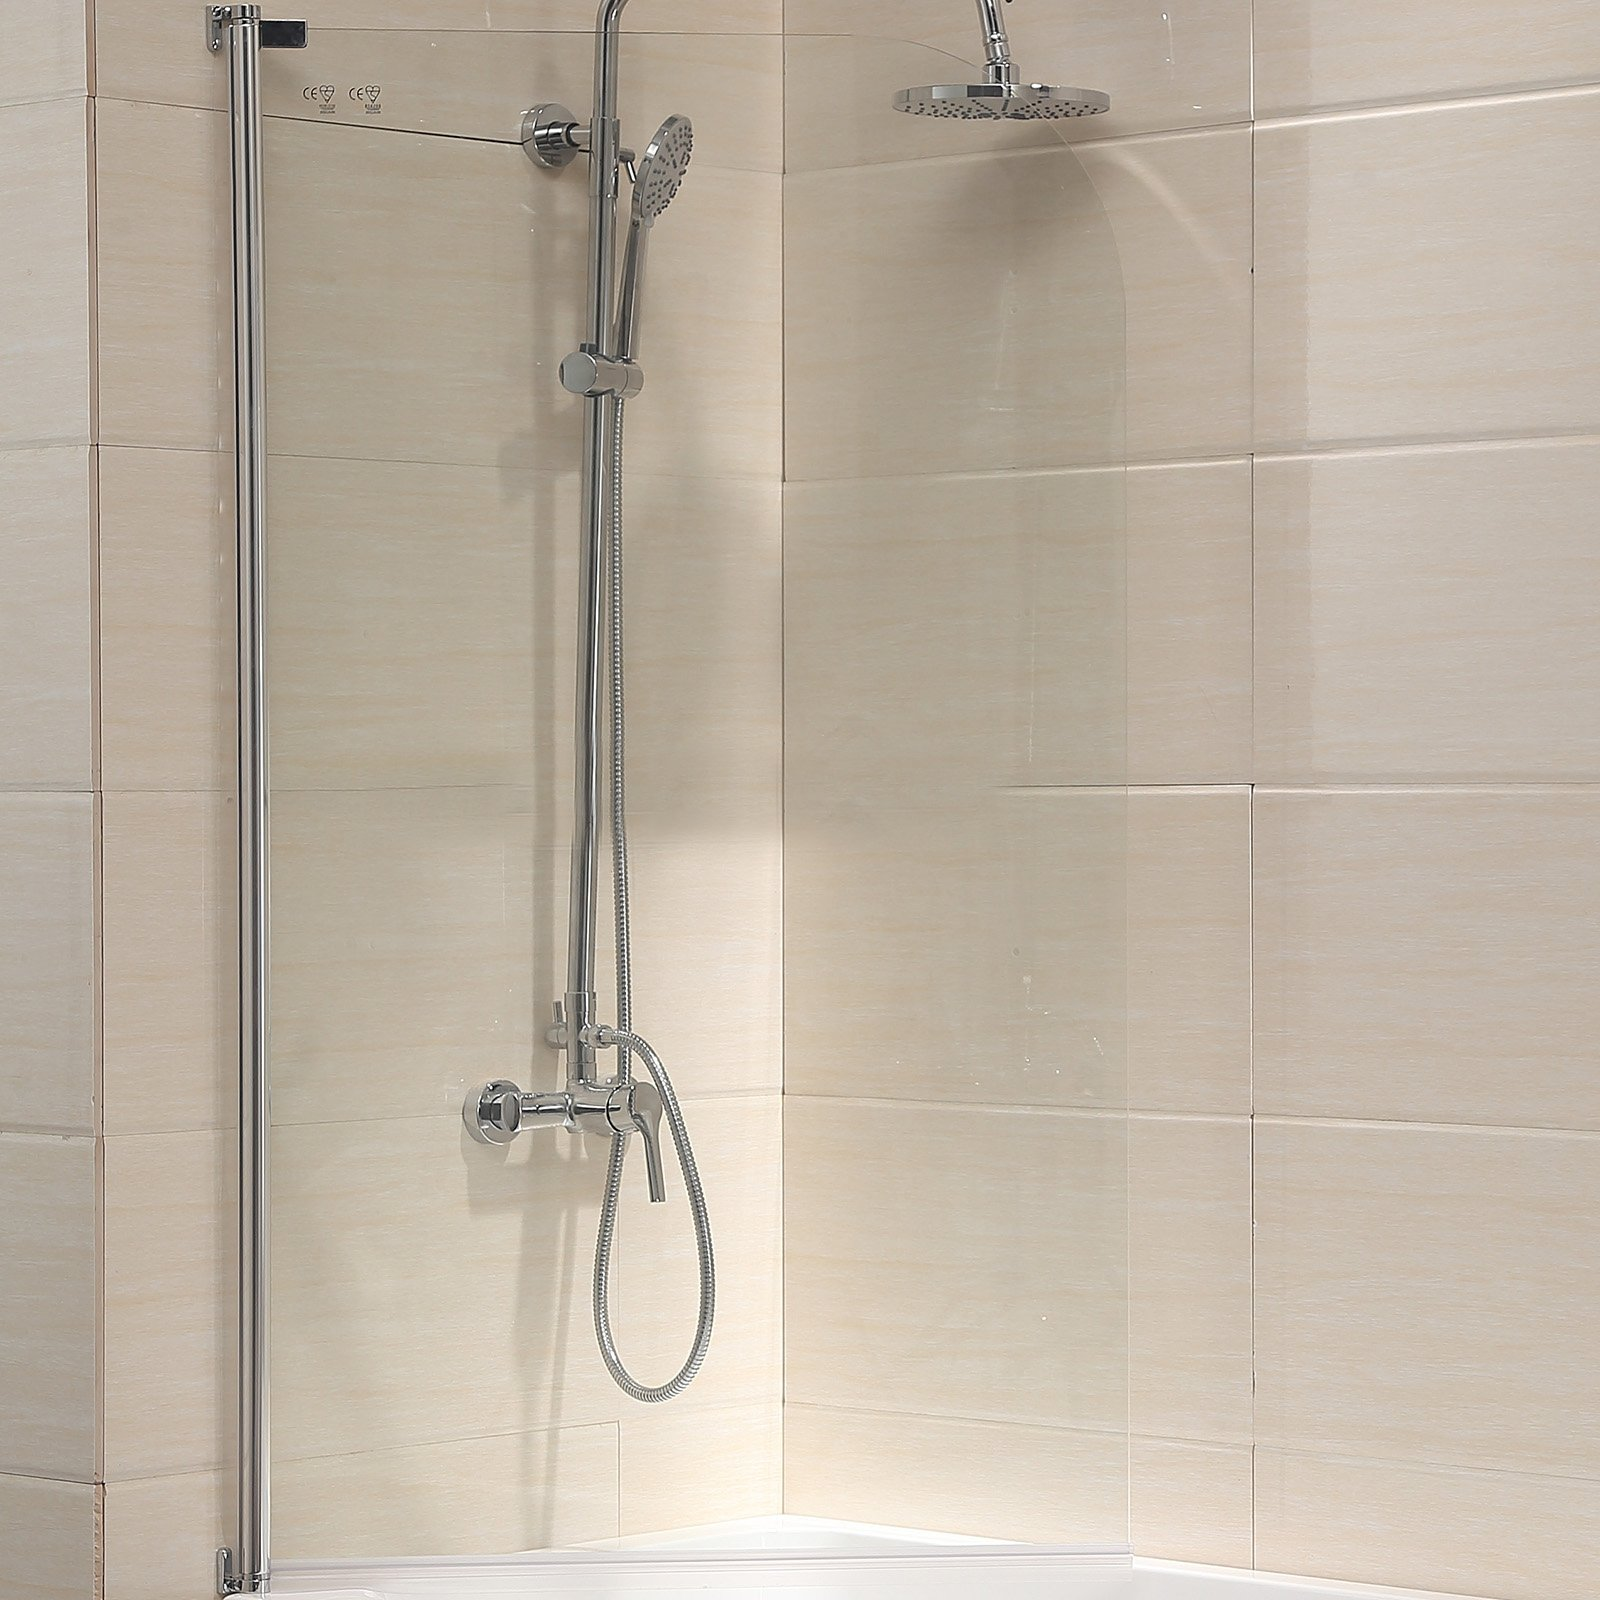 Mecor 55''X31'' Bathtub Shower Door 1/4'' Clear Glass Hinged Pivot Radius Frameless Chrome Finish by mecor (Image #3)